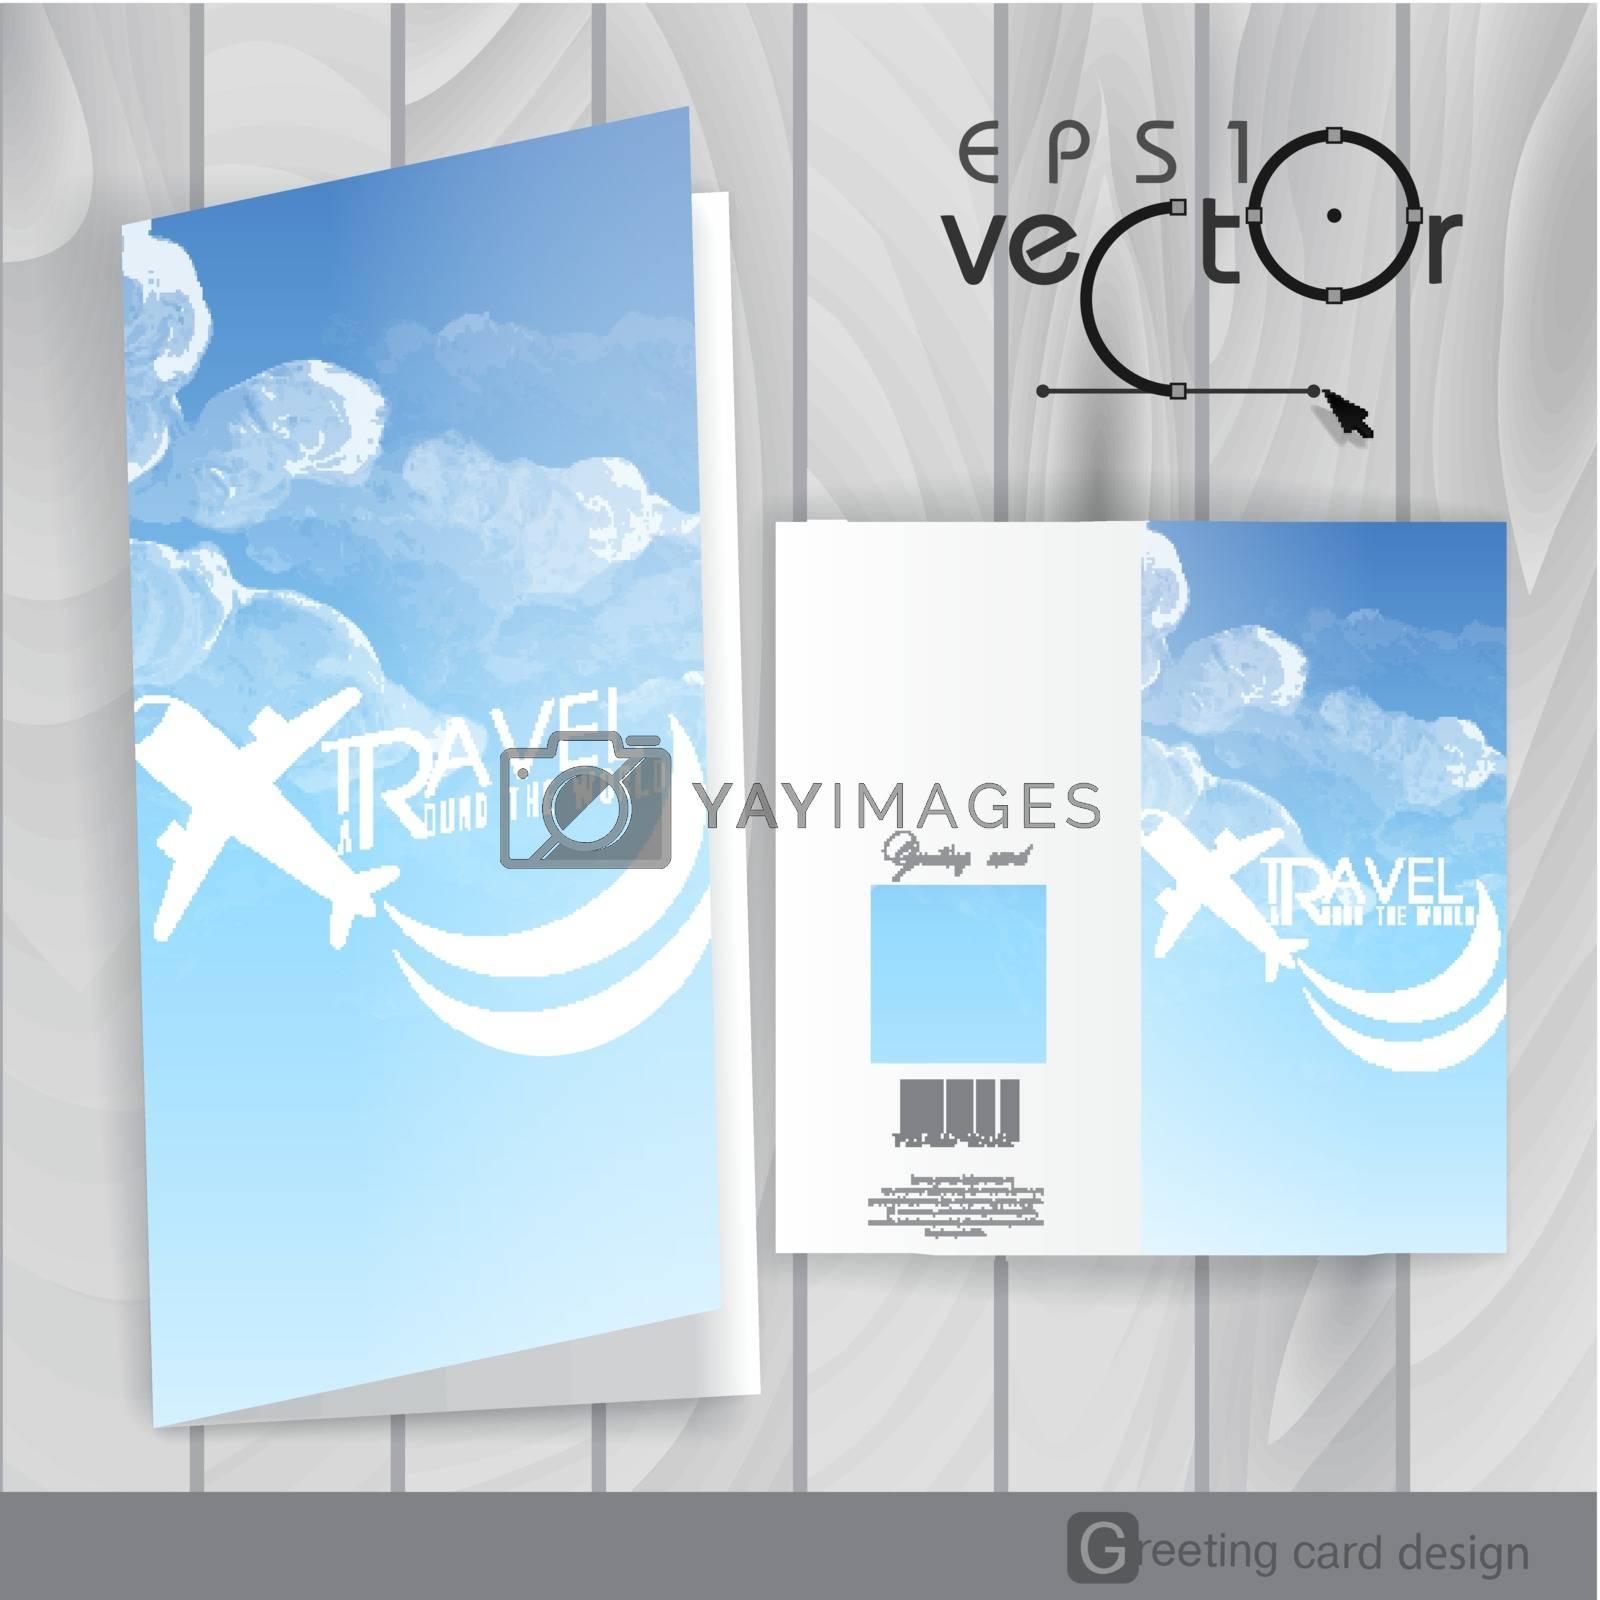 Greeting Card Design, Template. Vector Illustration. Eps 10